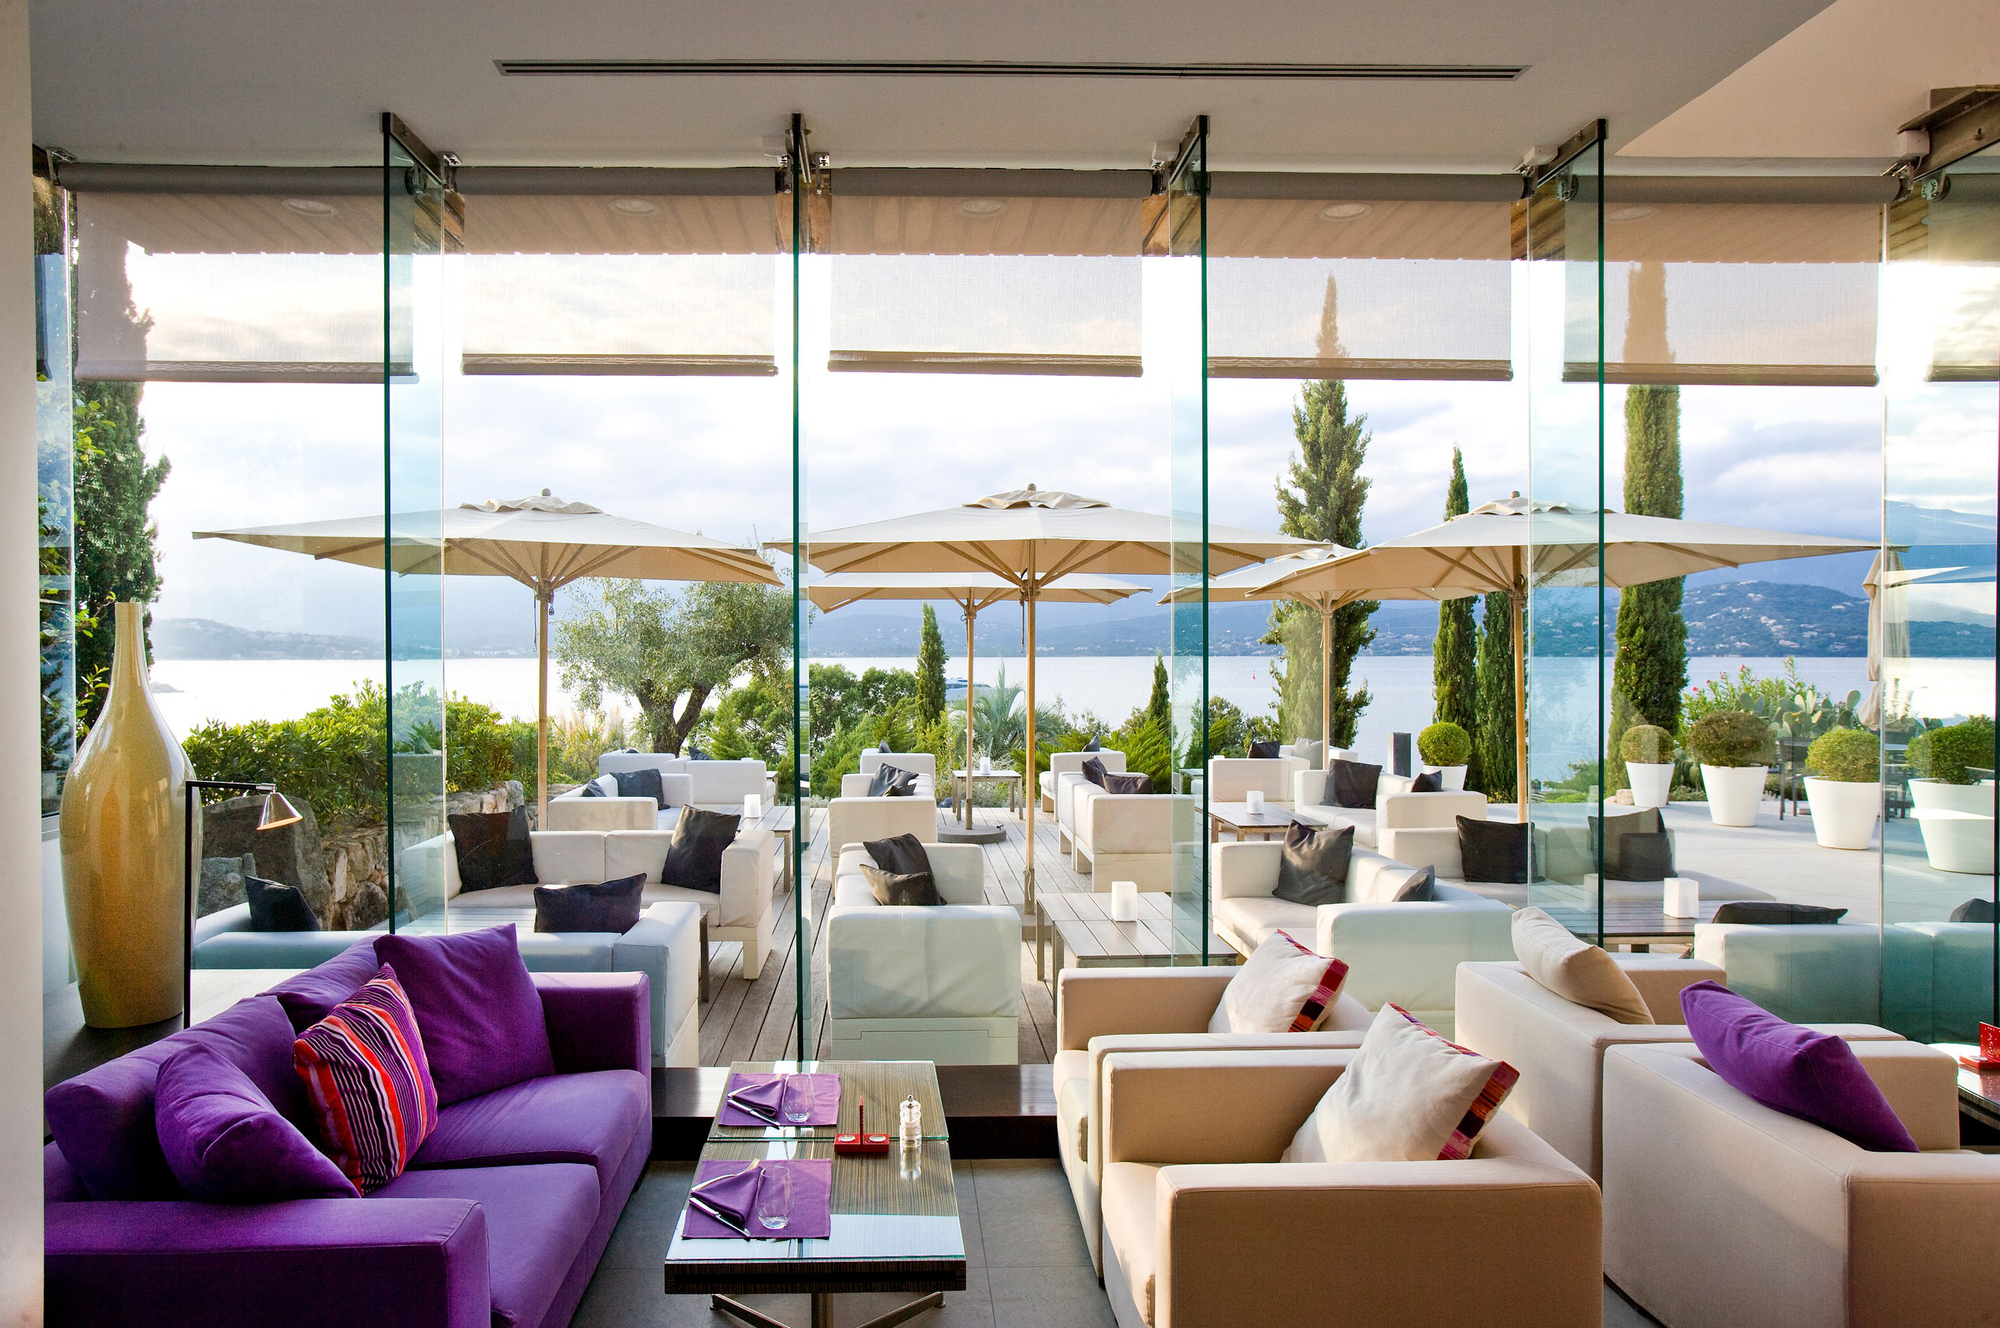 casadelmar-hotel-jean-fran-ois-bodin_-20